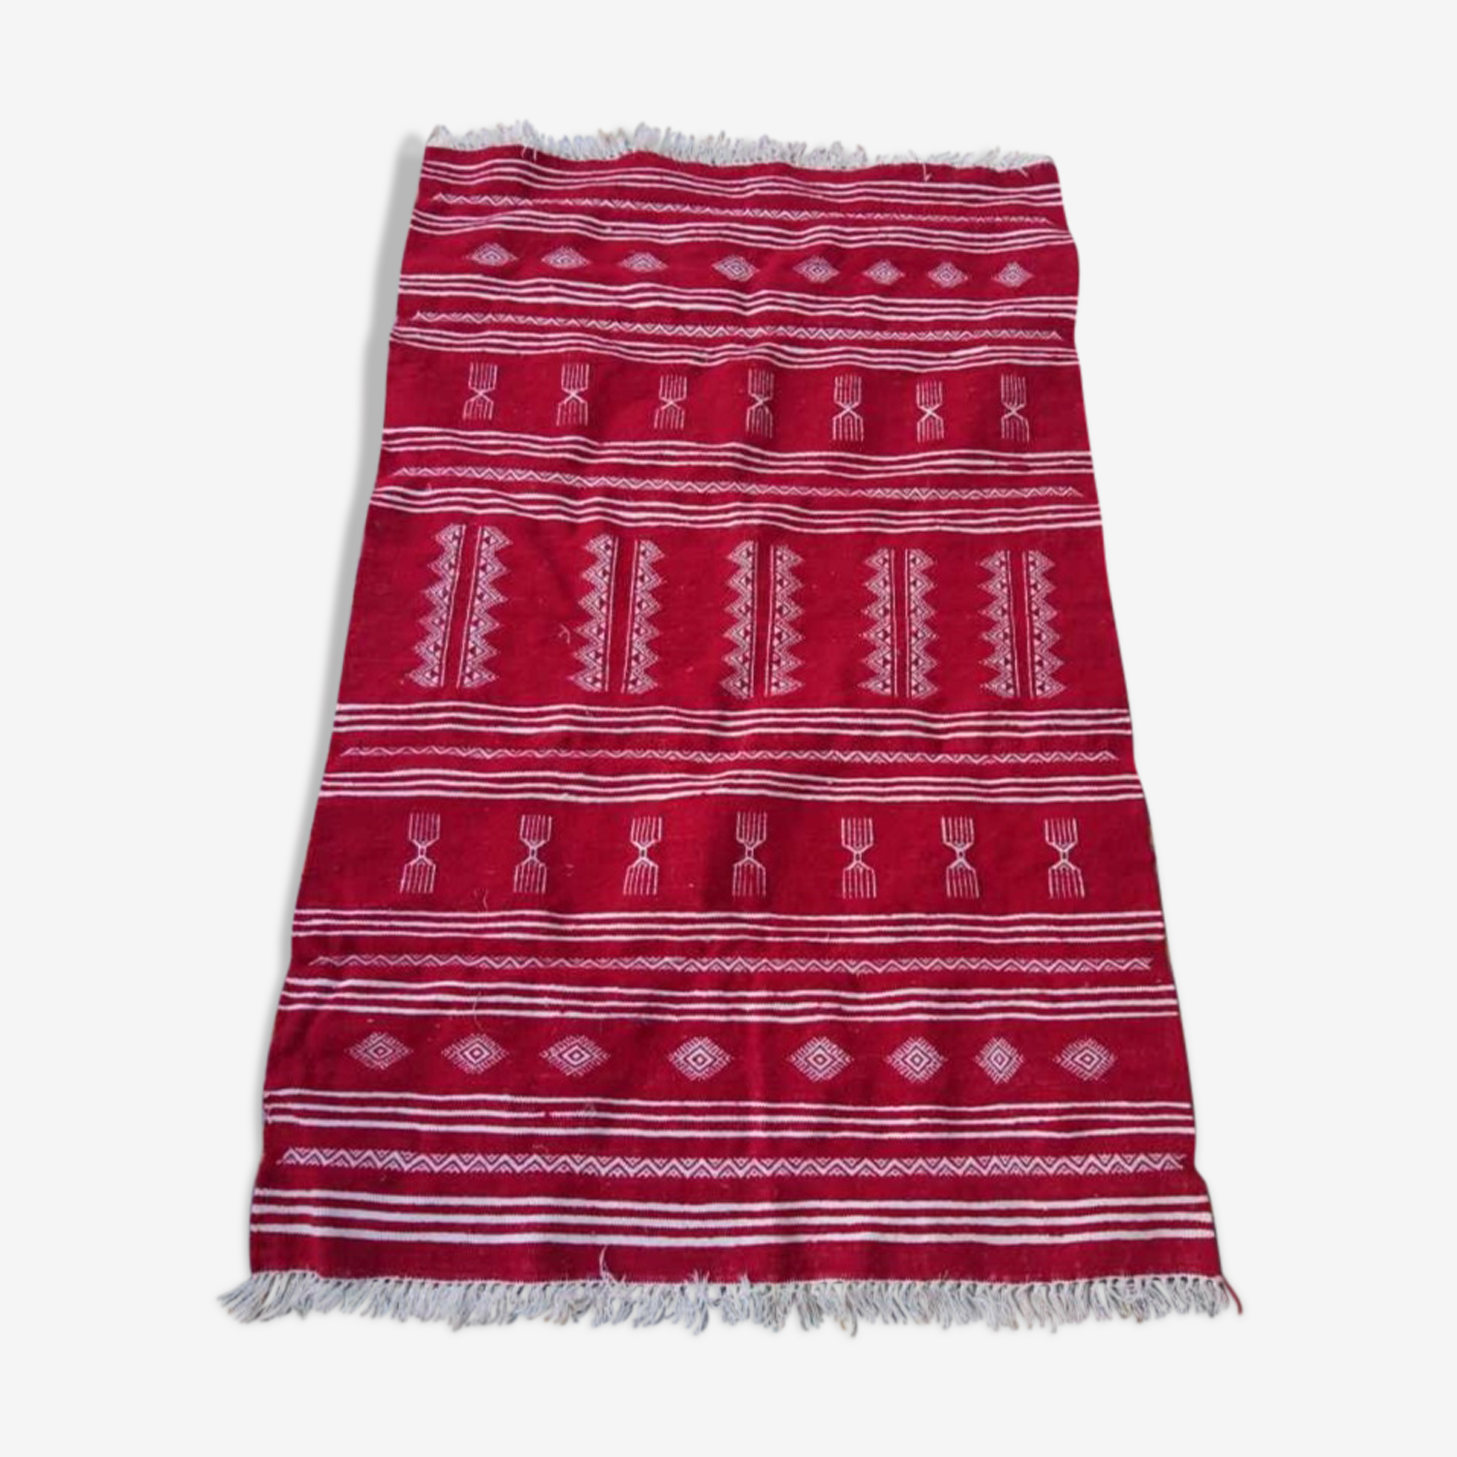 Tapis kilim rouge 100x150cm